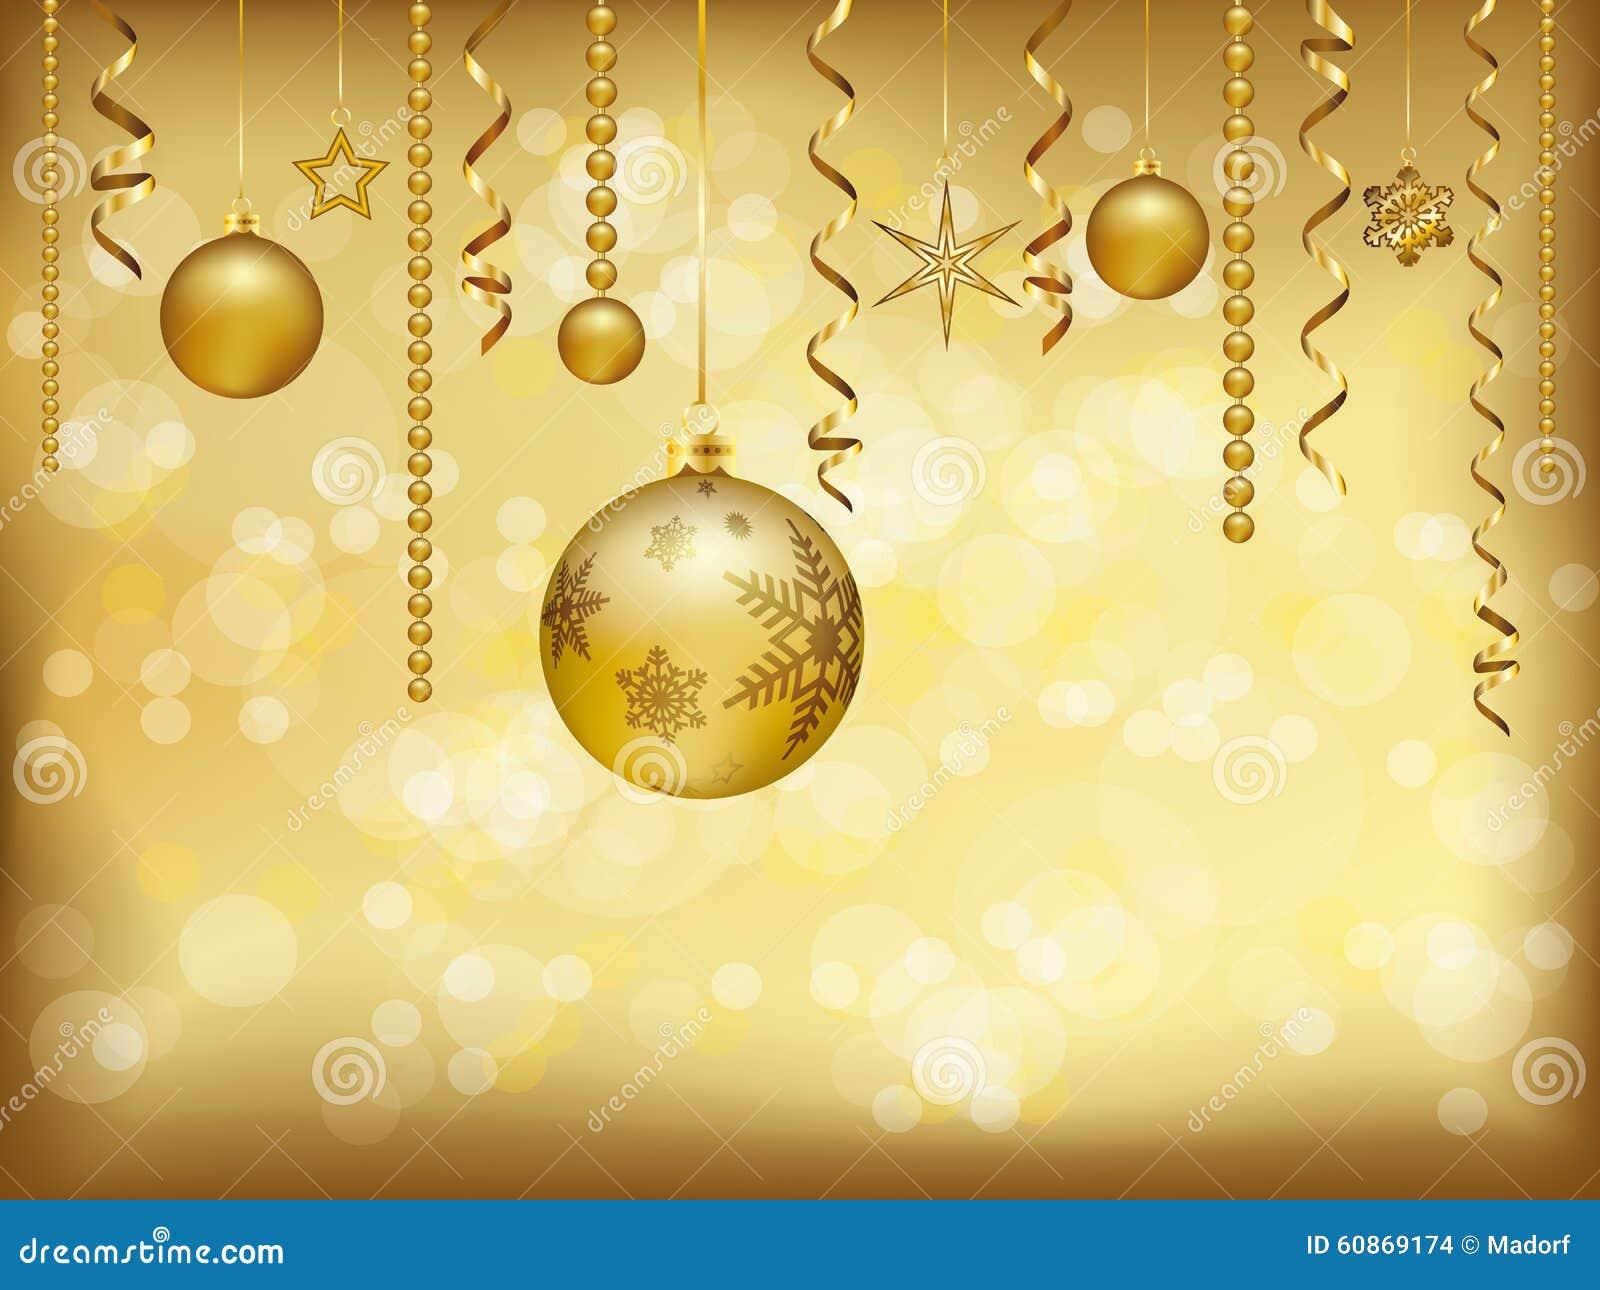 Elegant Christmas Background: Elegant Golden Christmas Background With Baubles And